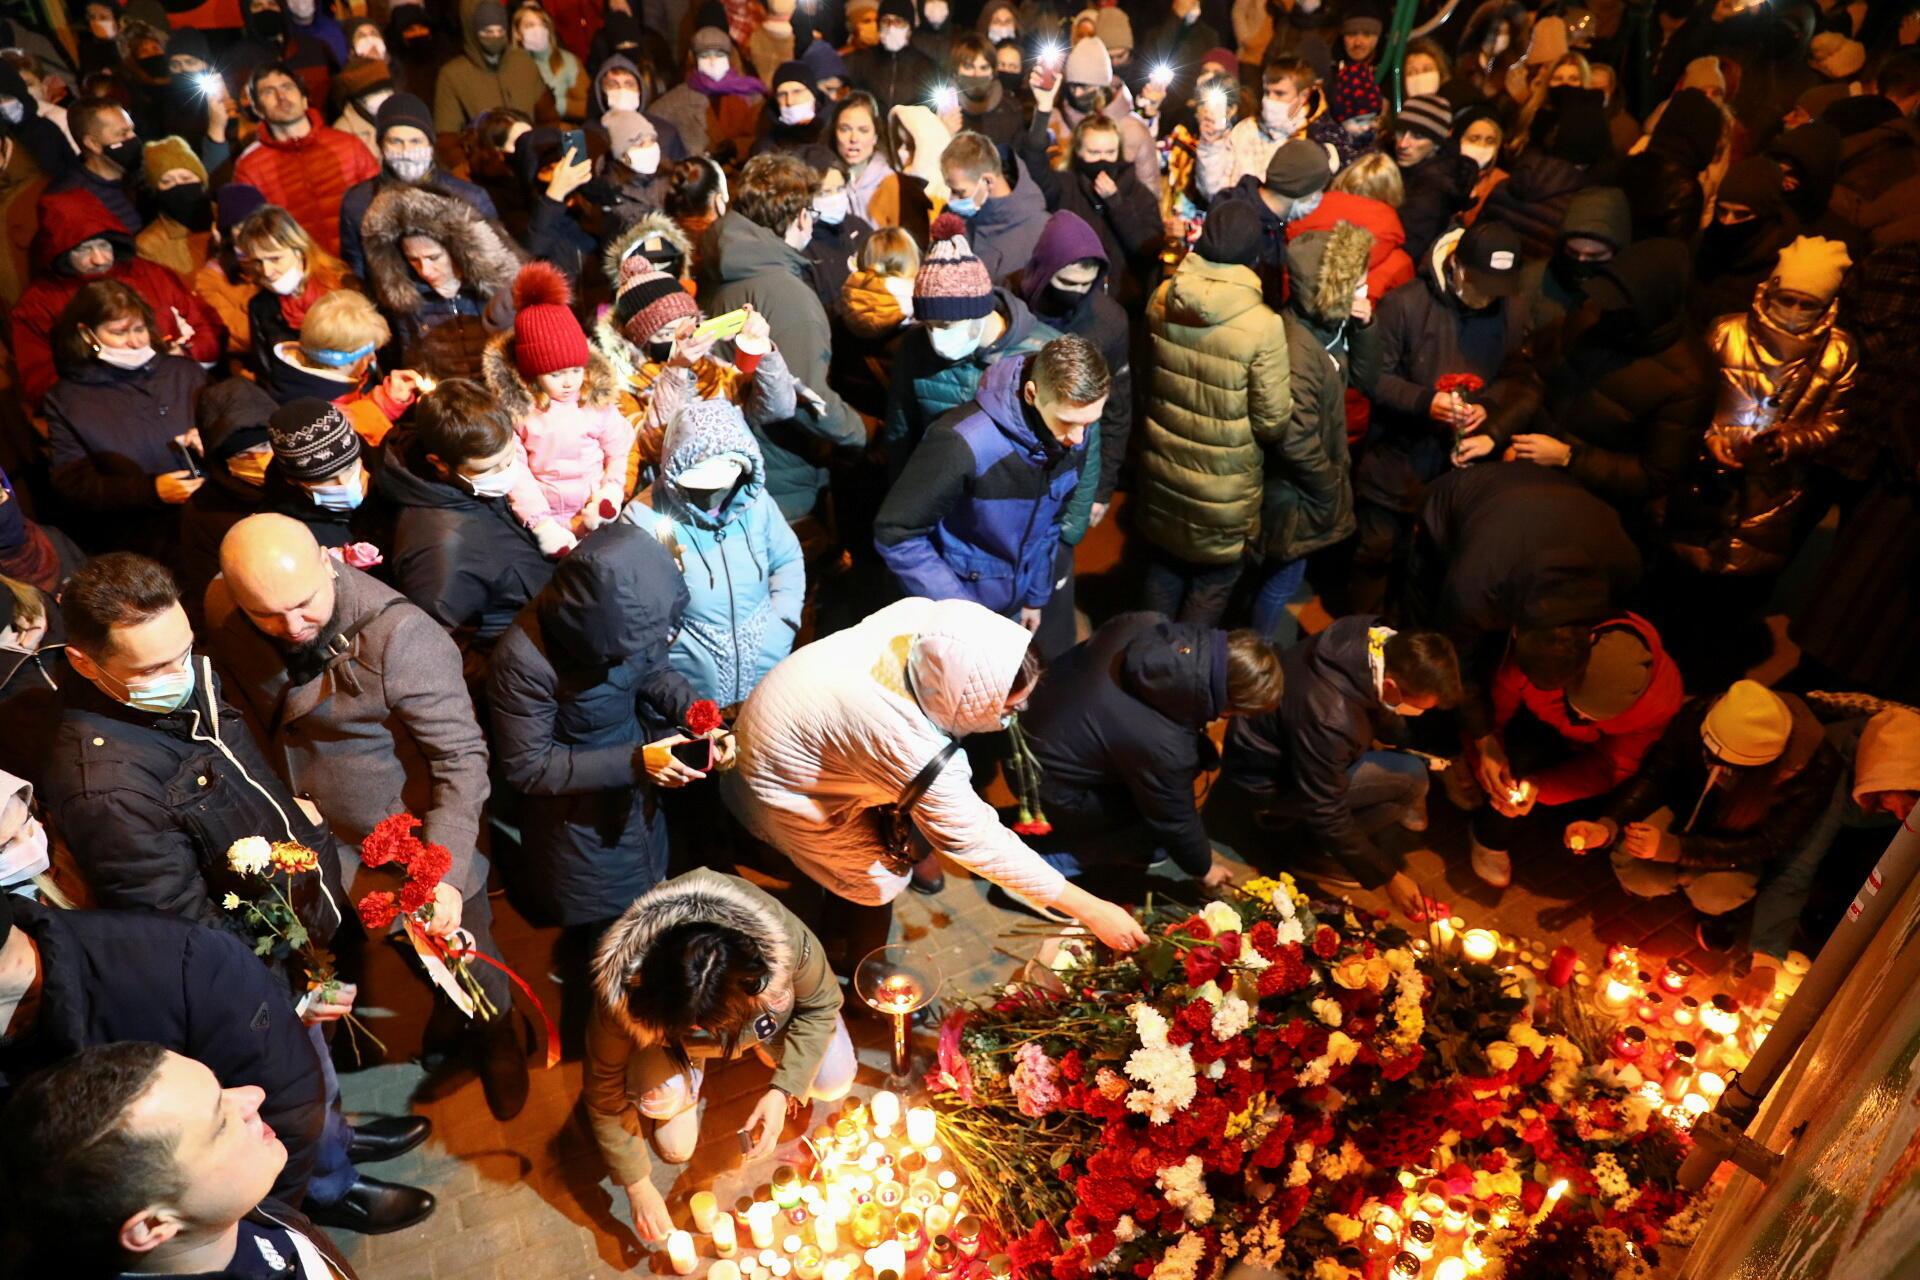 2020-11-13T073316Z_2035358378_RC272K9ADF9R_RTRMADP_3_BELARUS-ELECTION-PROTESTS-DEATH